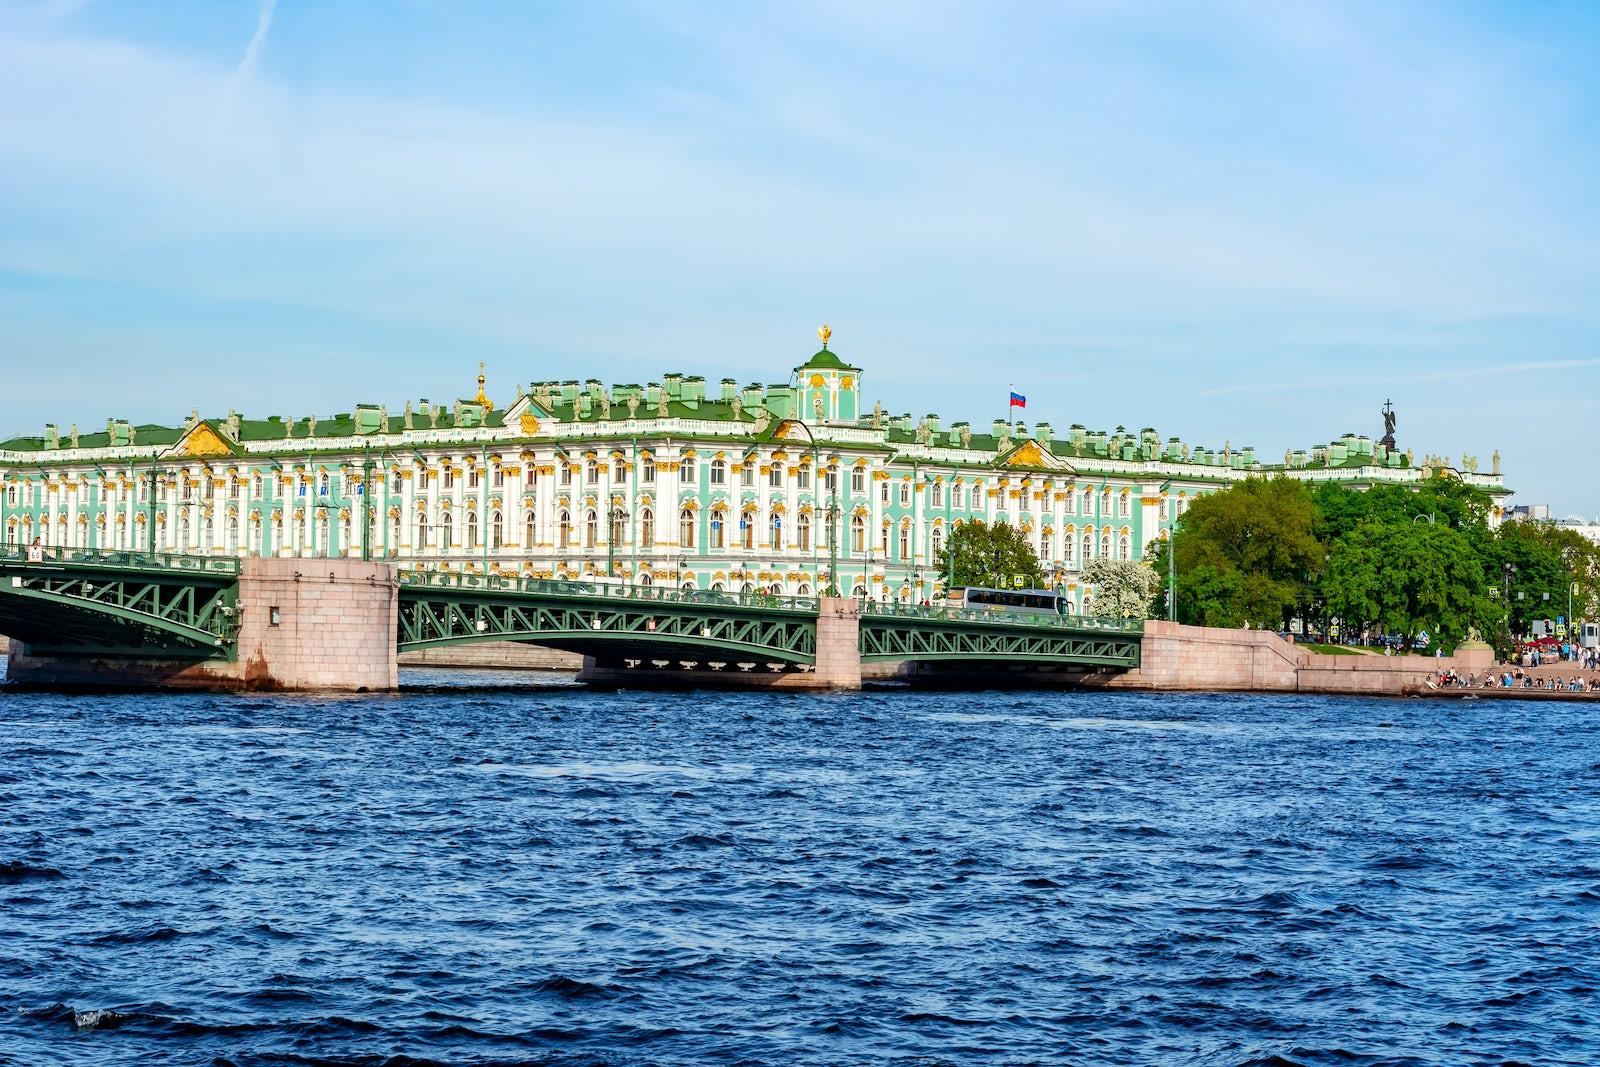 © istock/Vladislav Zolotov